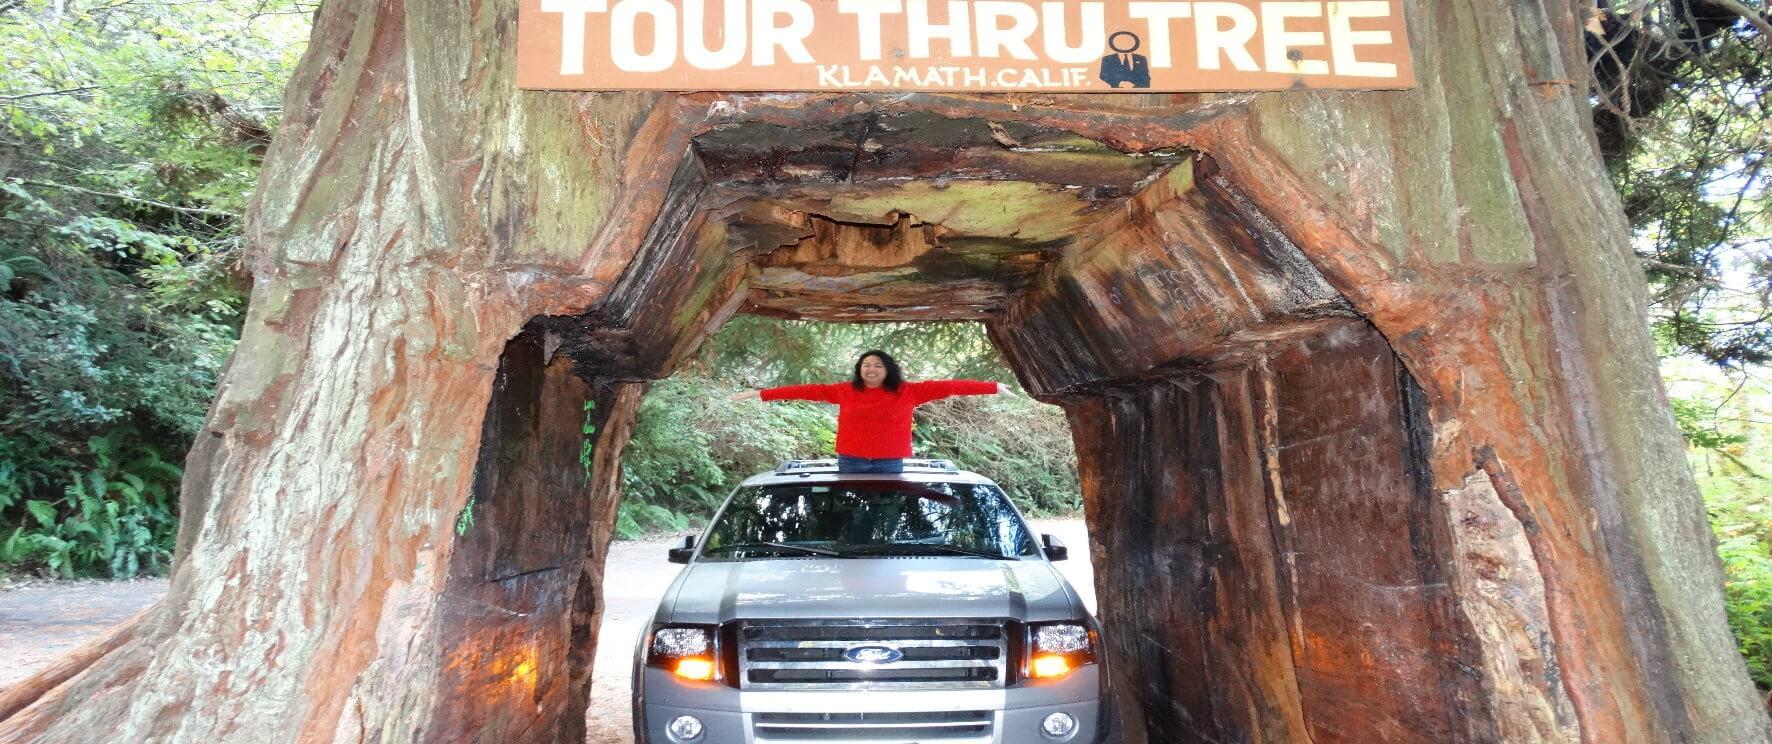 drive-through-tree-redwood-national-park